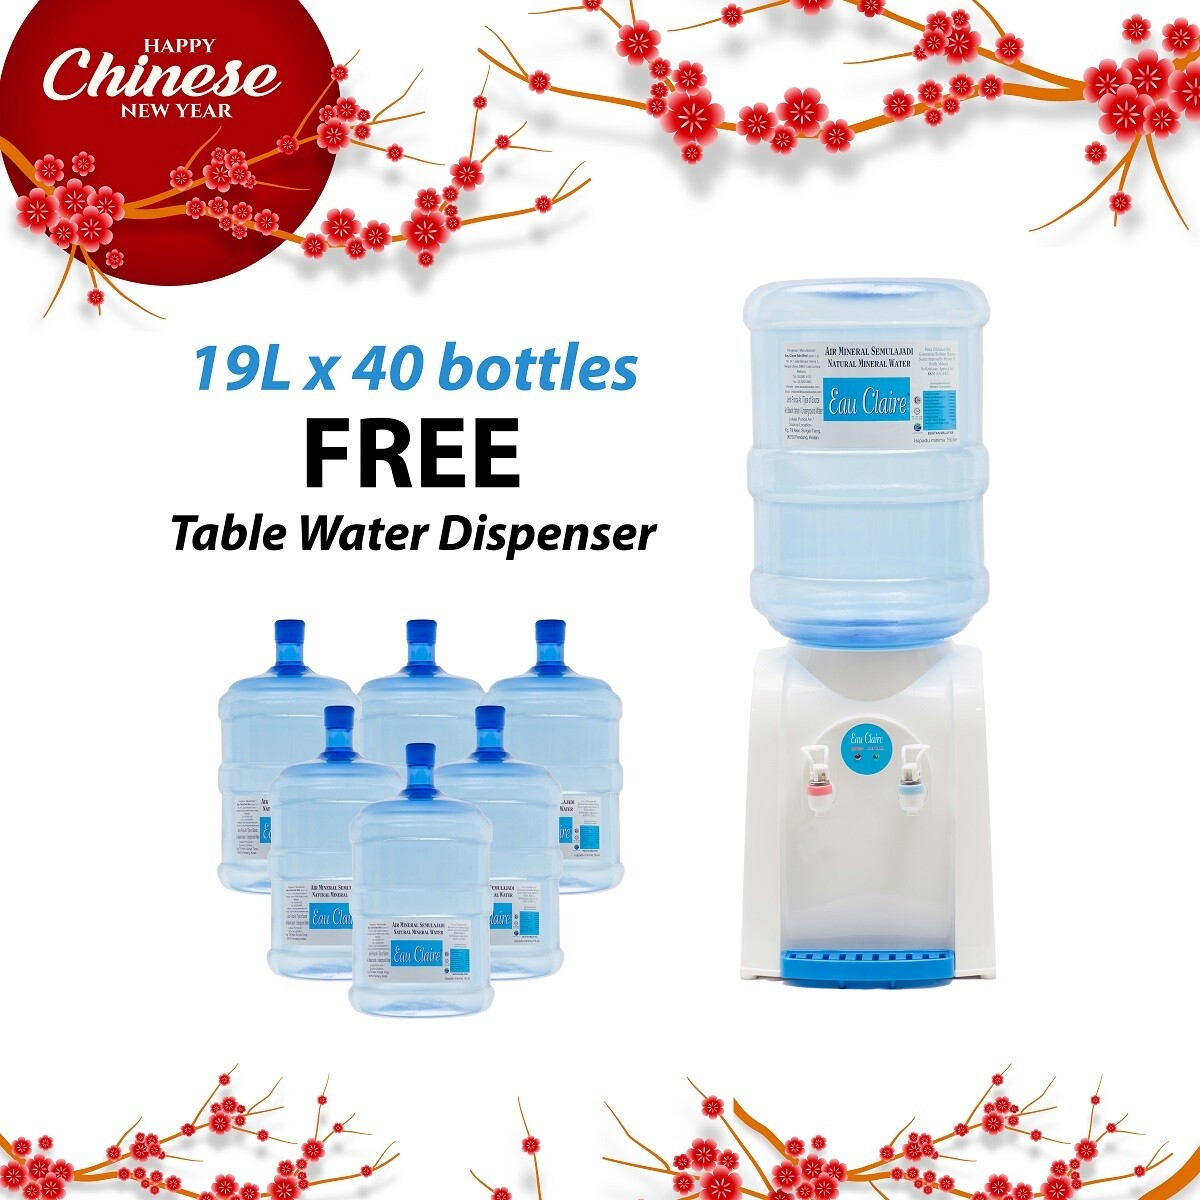 PACKAGE B : EAU CLAIRE 19L x 40 bottles FREE Table Top Water Dispenser